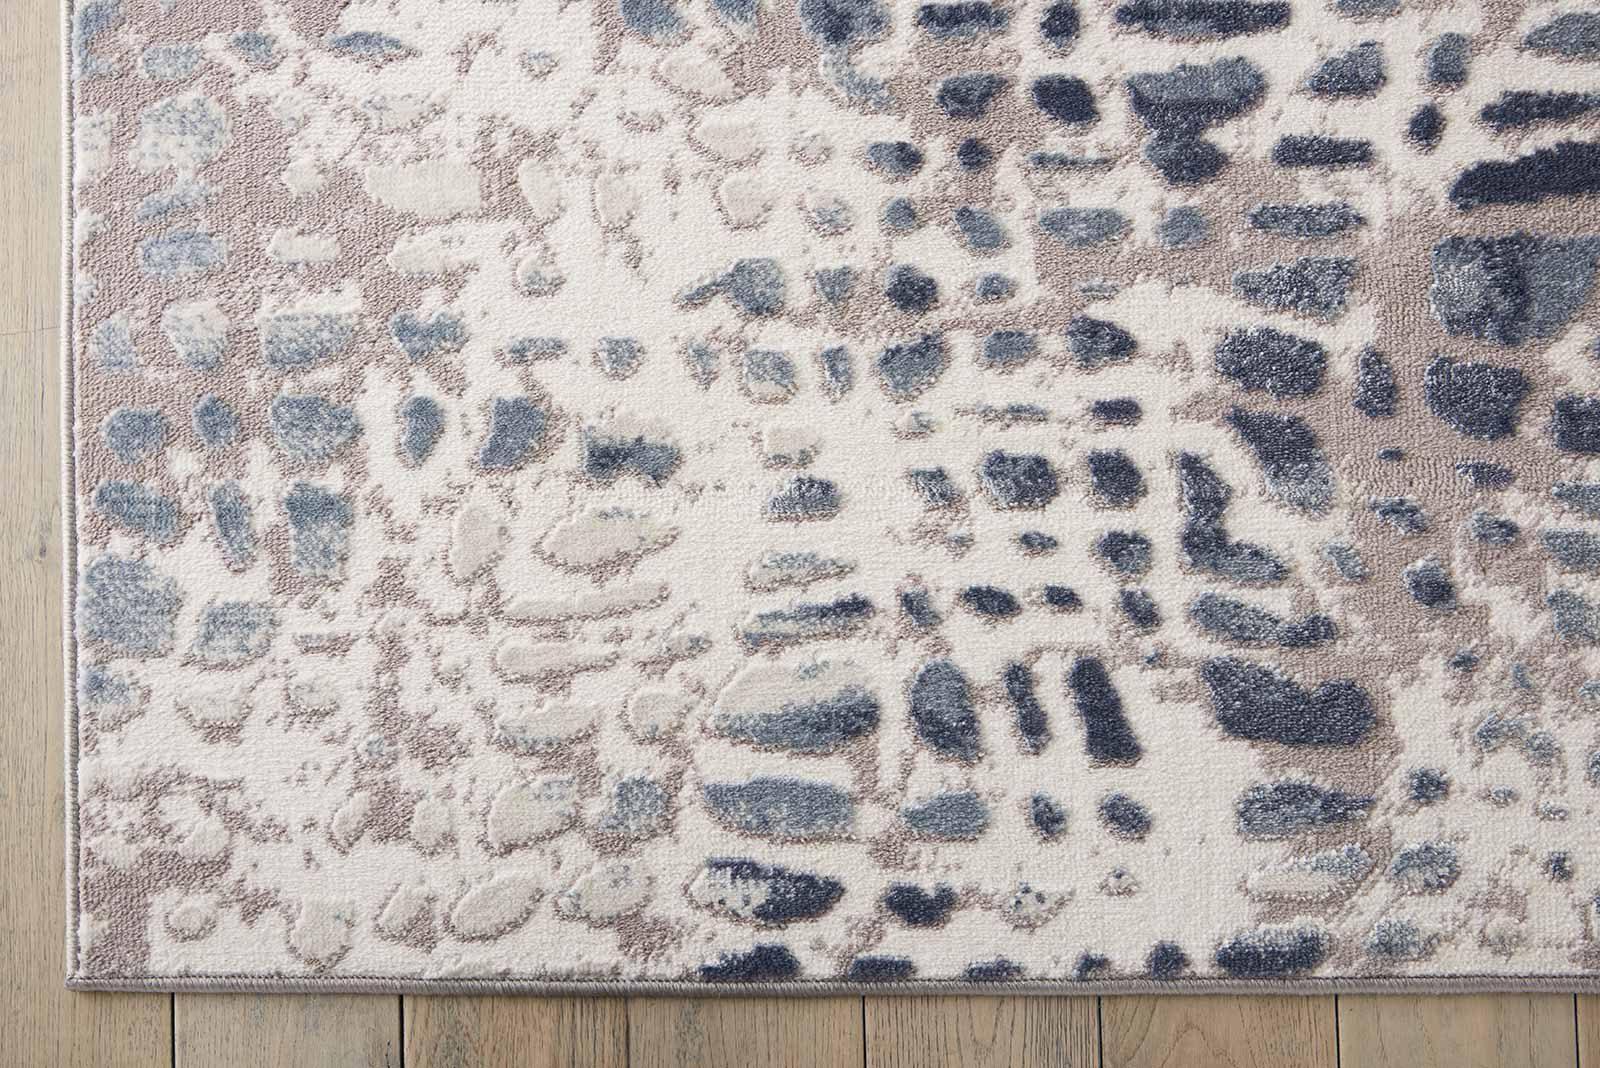 Nourison rug Urban Decor URD04 IVGRY 5x7 099446467119 main 4